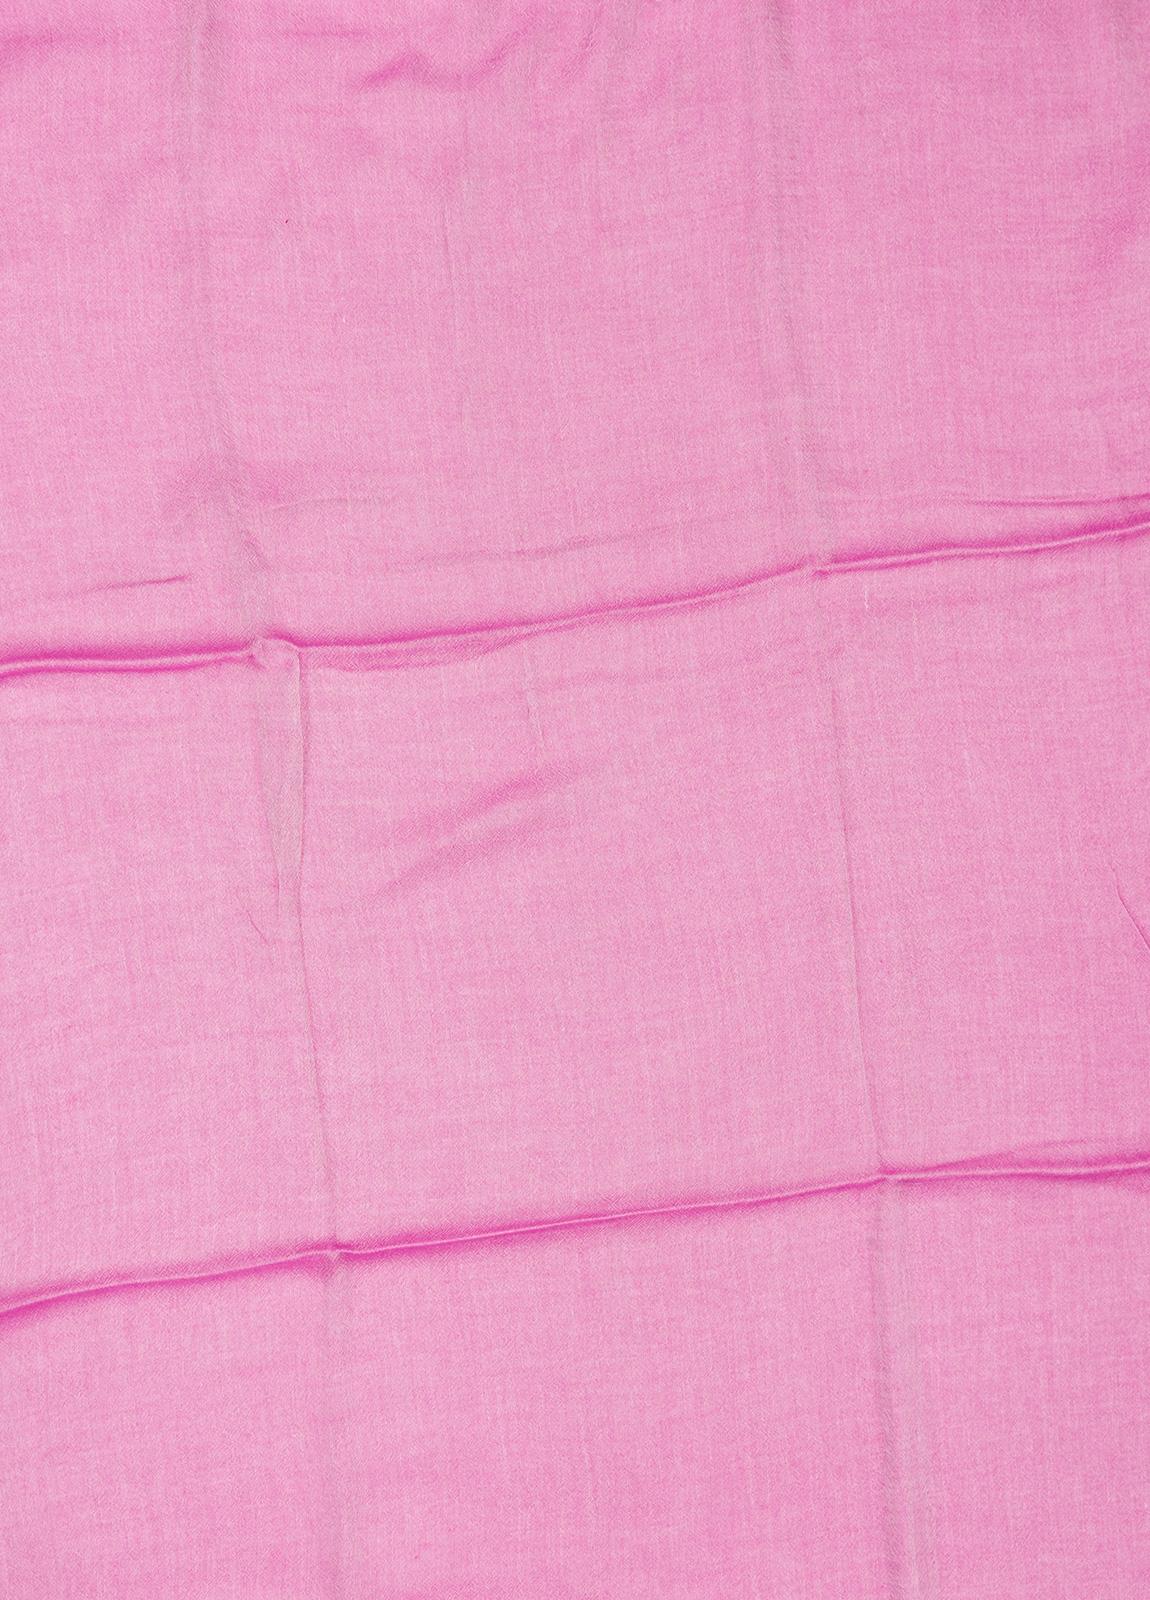 Foulard liso color rosa modelo GIGLIO 150 x 180 cm. 100% Modal - Ítem1